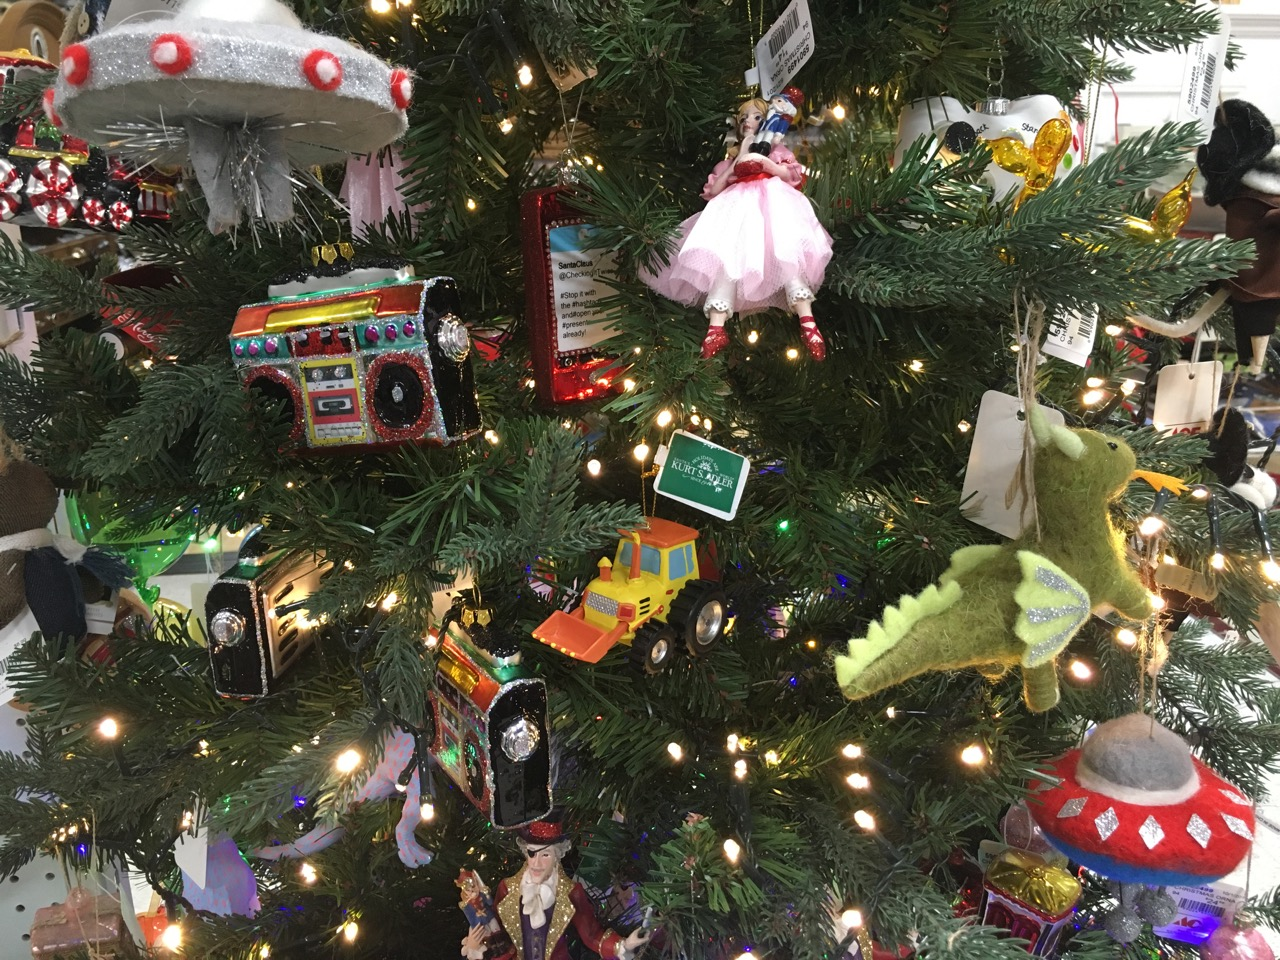 2018 Christmas Trees at Blackhawk Hardware